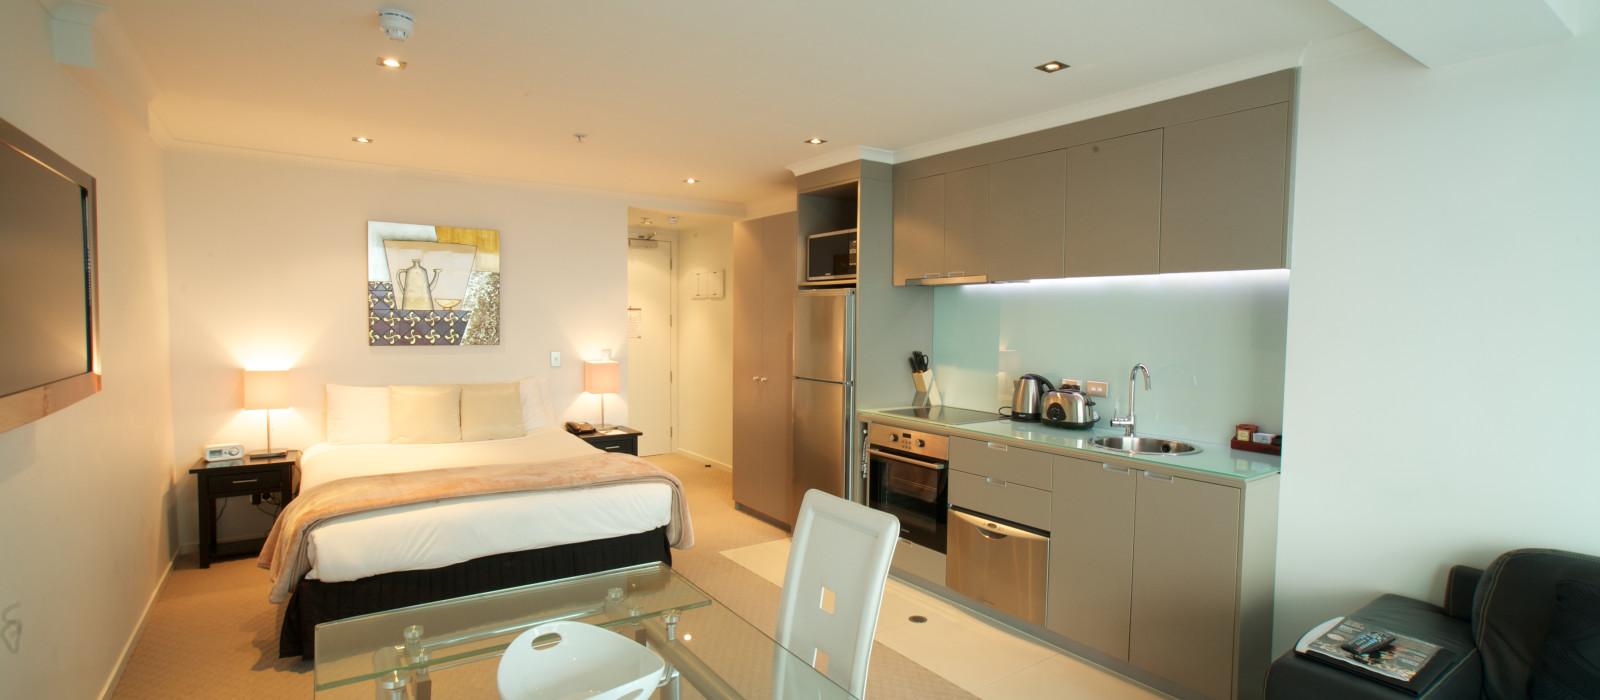 Hotel Distinction WLG New Zealand